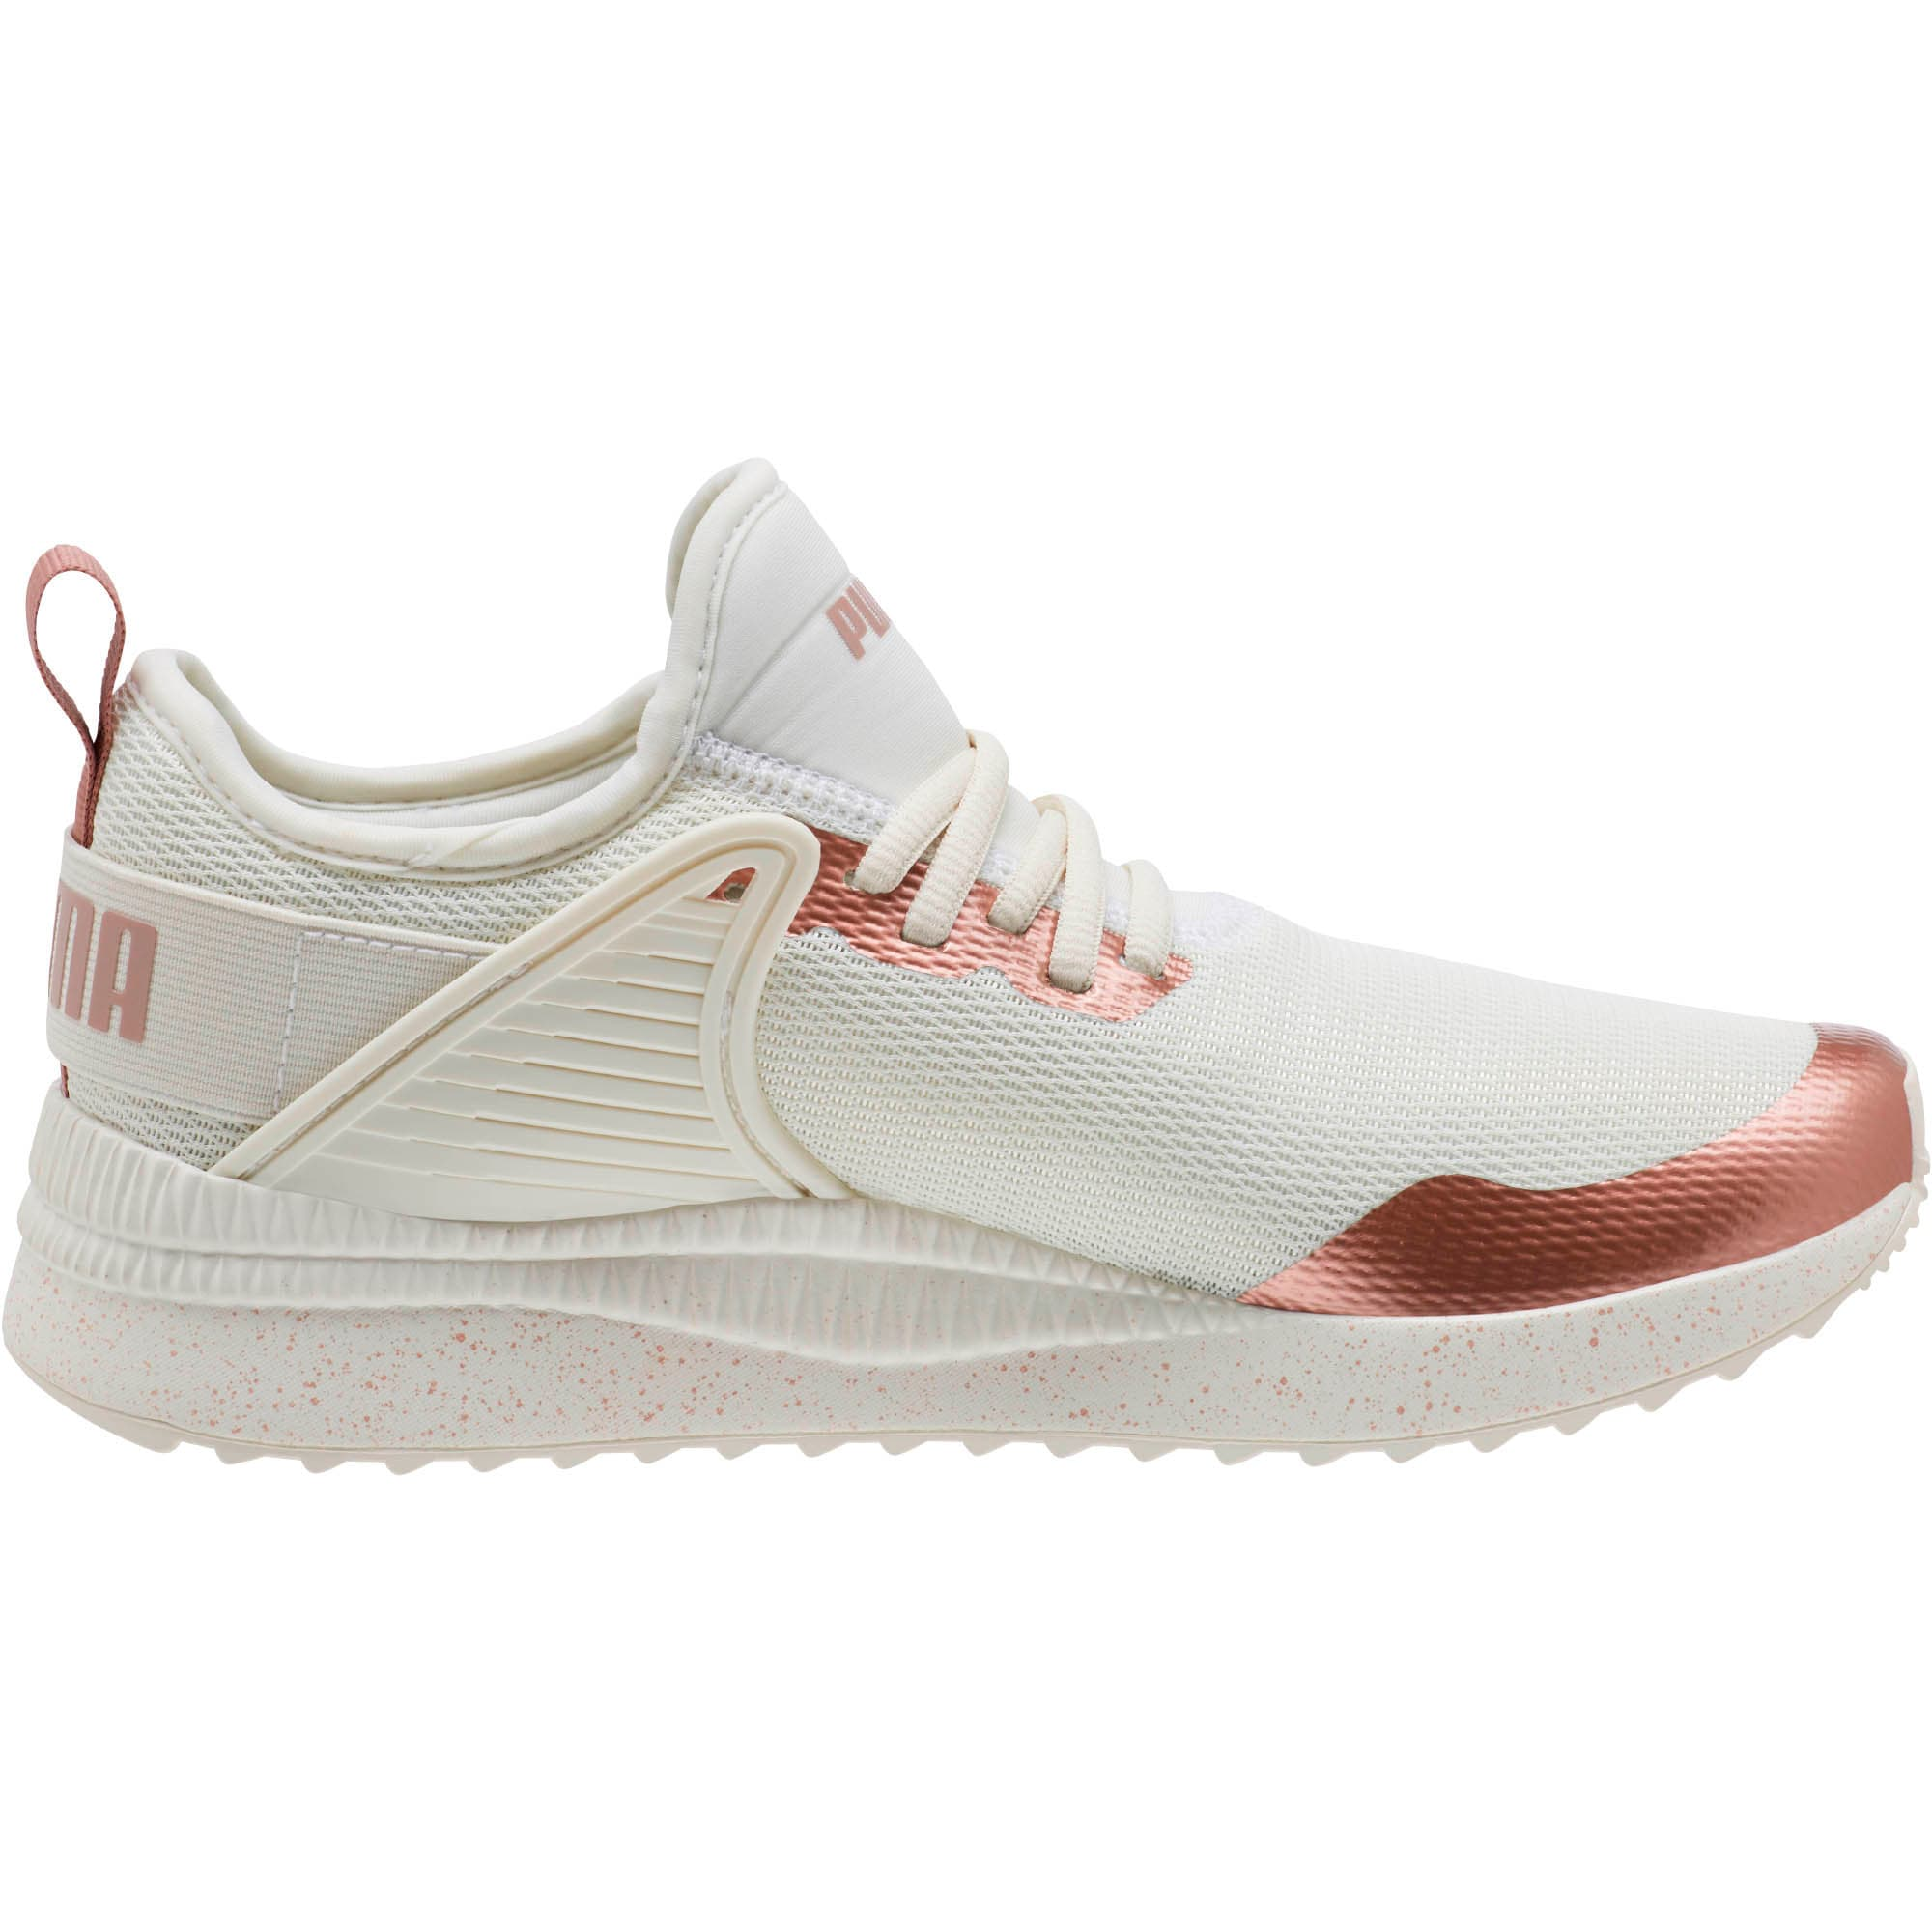 Thumbnail 3 of Pacer Nex tCage Metallic Speckle Women's Sneakers, Whisper White-Rose Gold, medium